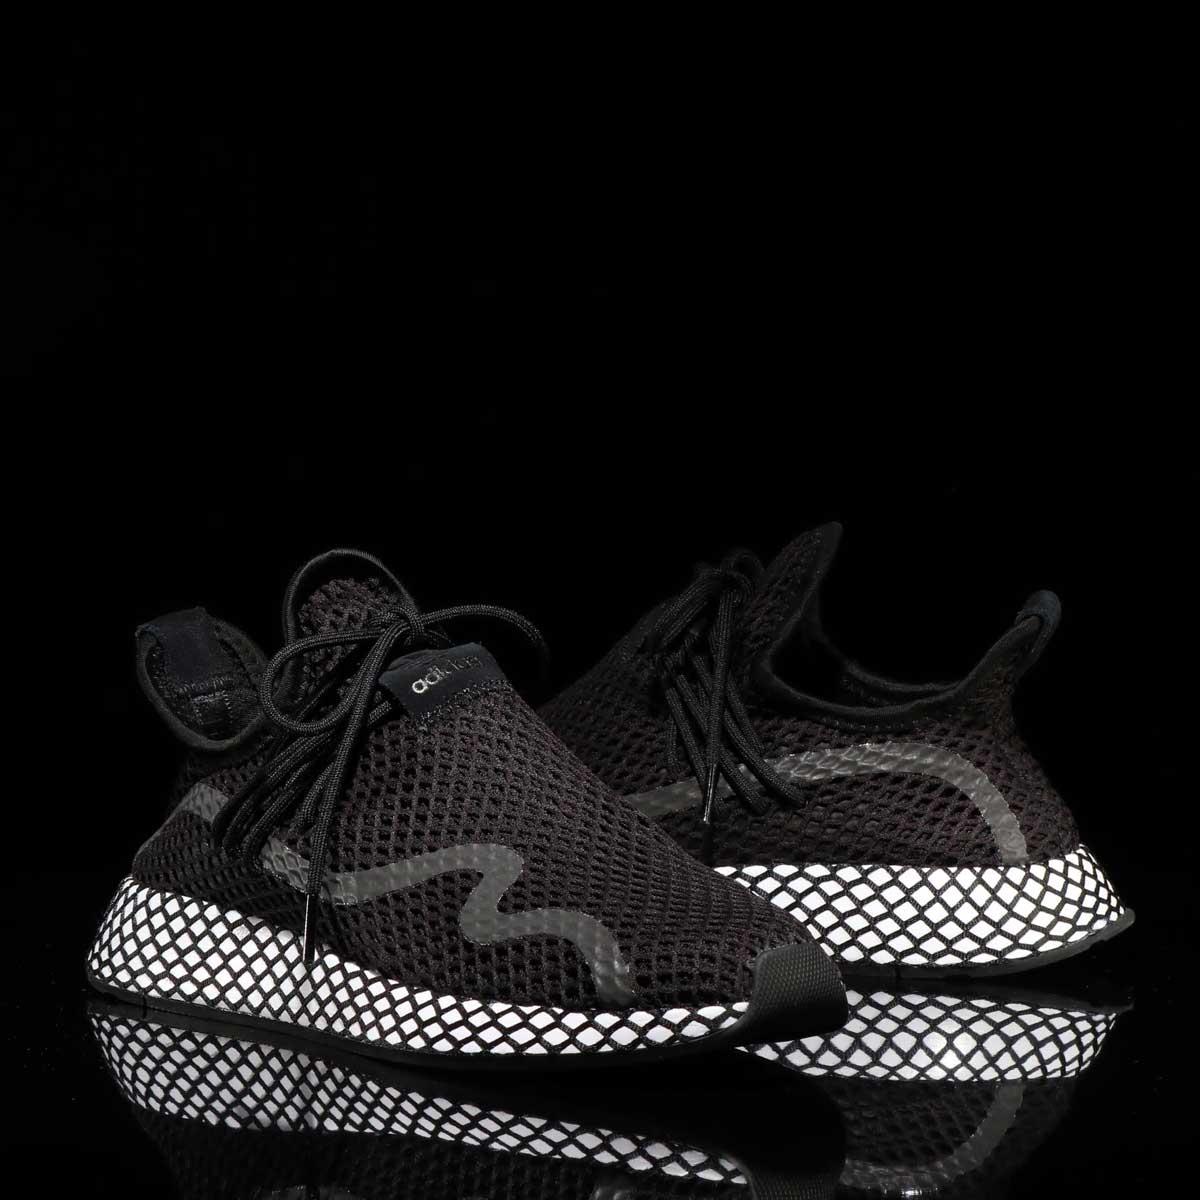 adidas Originals DEERUPT NEW RUNNER(アディダスオリジナルス ディーラプト ニュー ランナー)CORE BLACK/CORE BLACK/RUNNING WHITE【メンズ レディース スニーカー】19SS-I